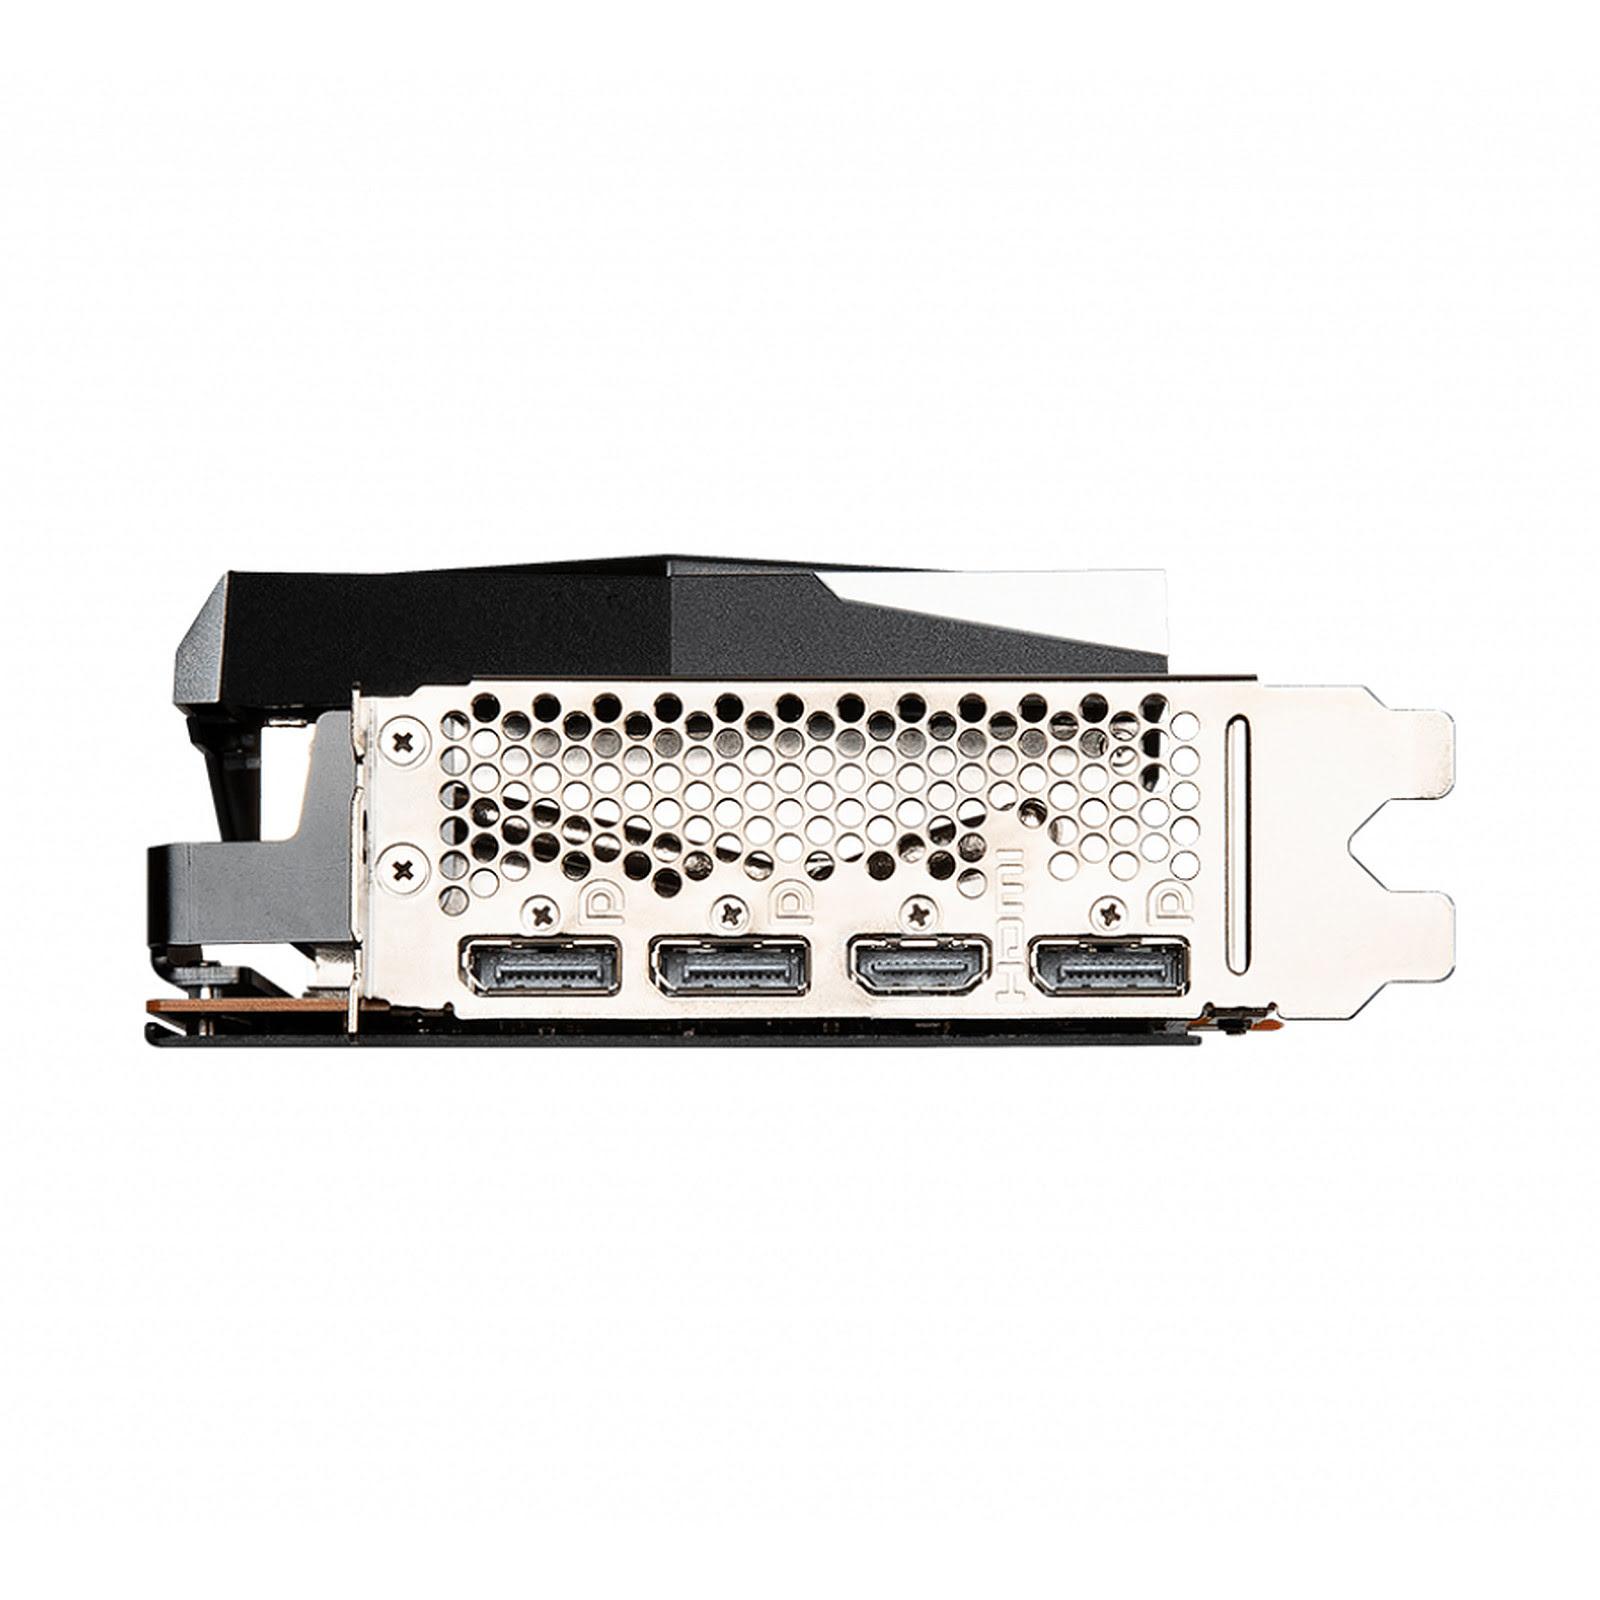 Radeon RX 6700 XT GAMING X 12G (912-V398-007) - Achat / Vente Carte graphique sur Picata.fr - 1